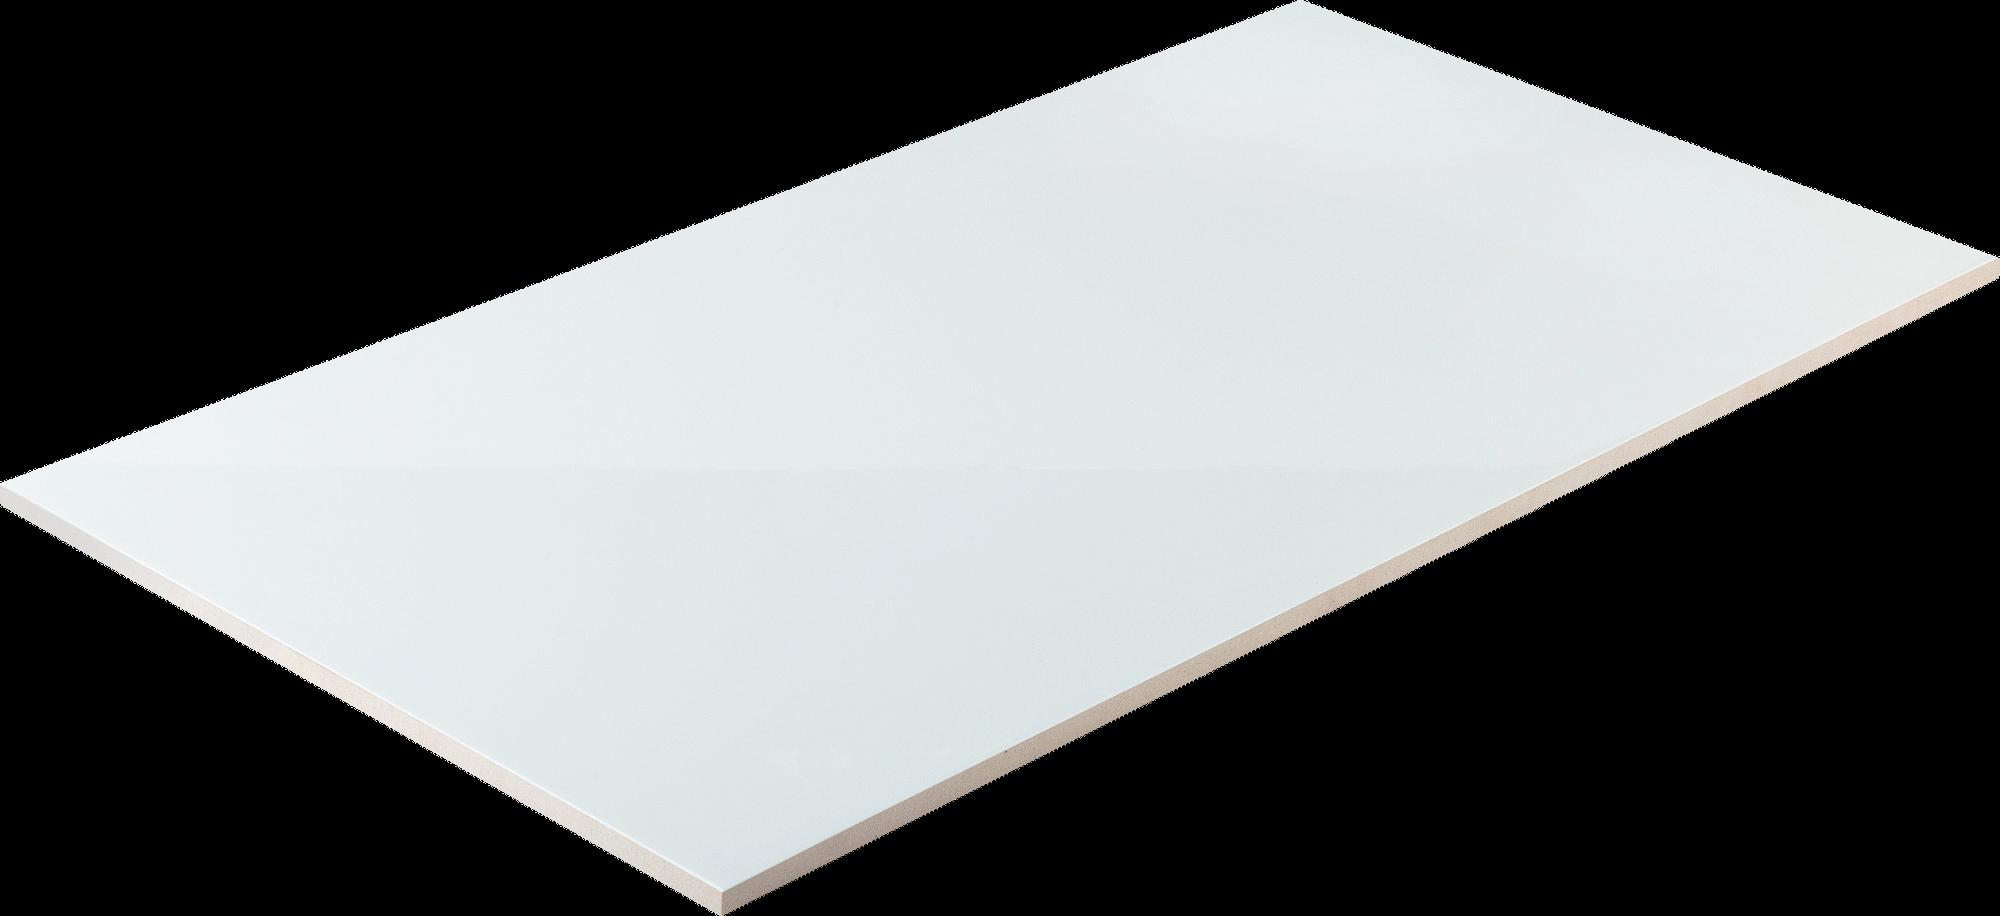 Cuscini Dorelan.Glossy White Wall Tile Bild Cuscino Dorelan Full Size Png